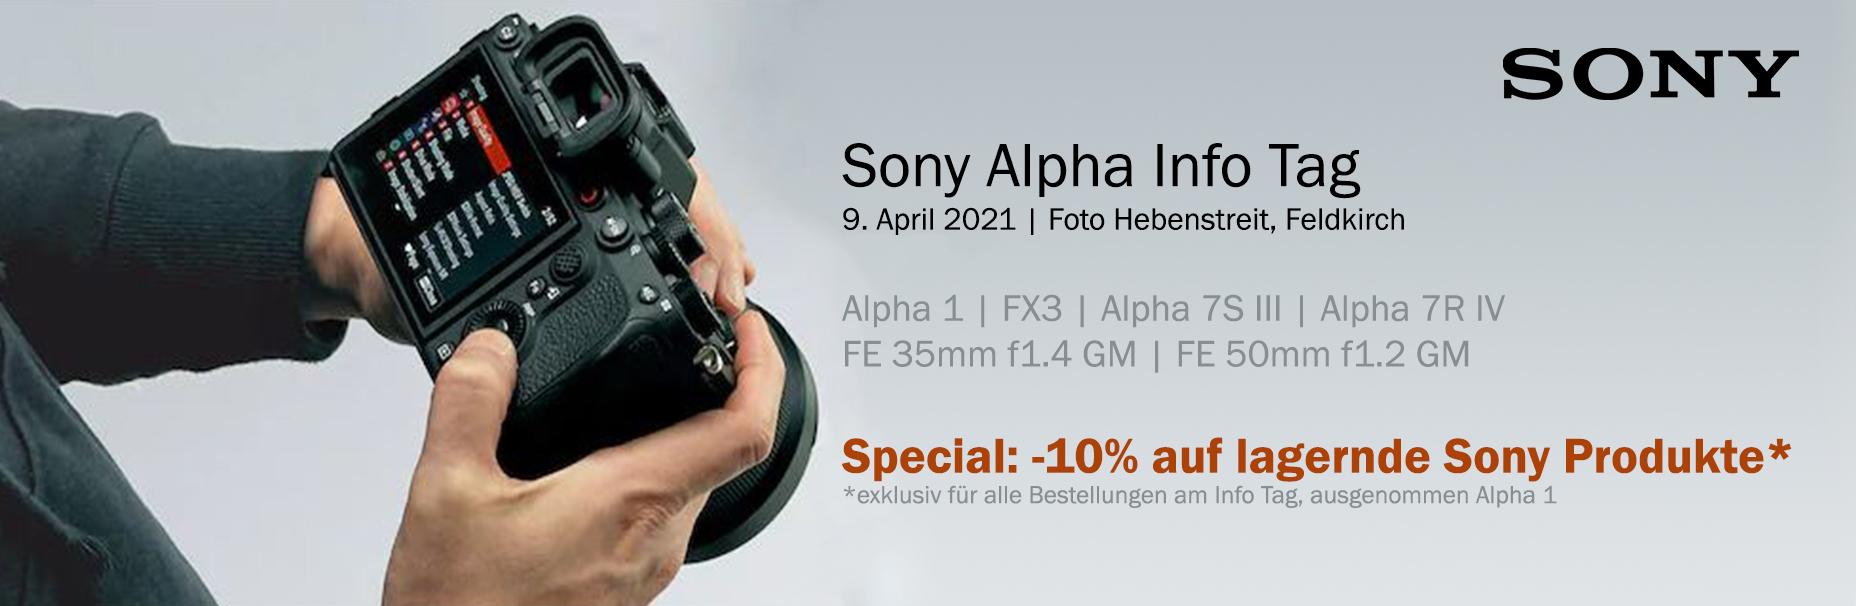 Sony Alpha Info Tag - sei dabei!